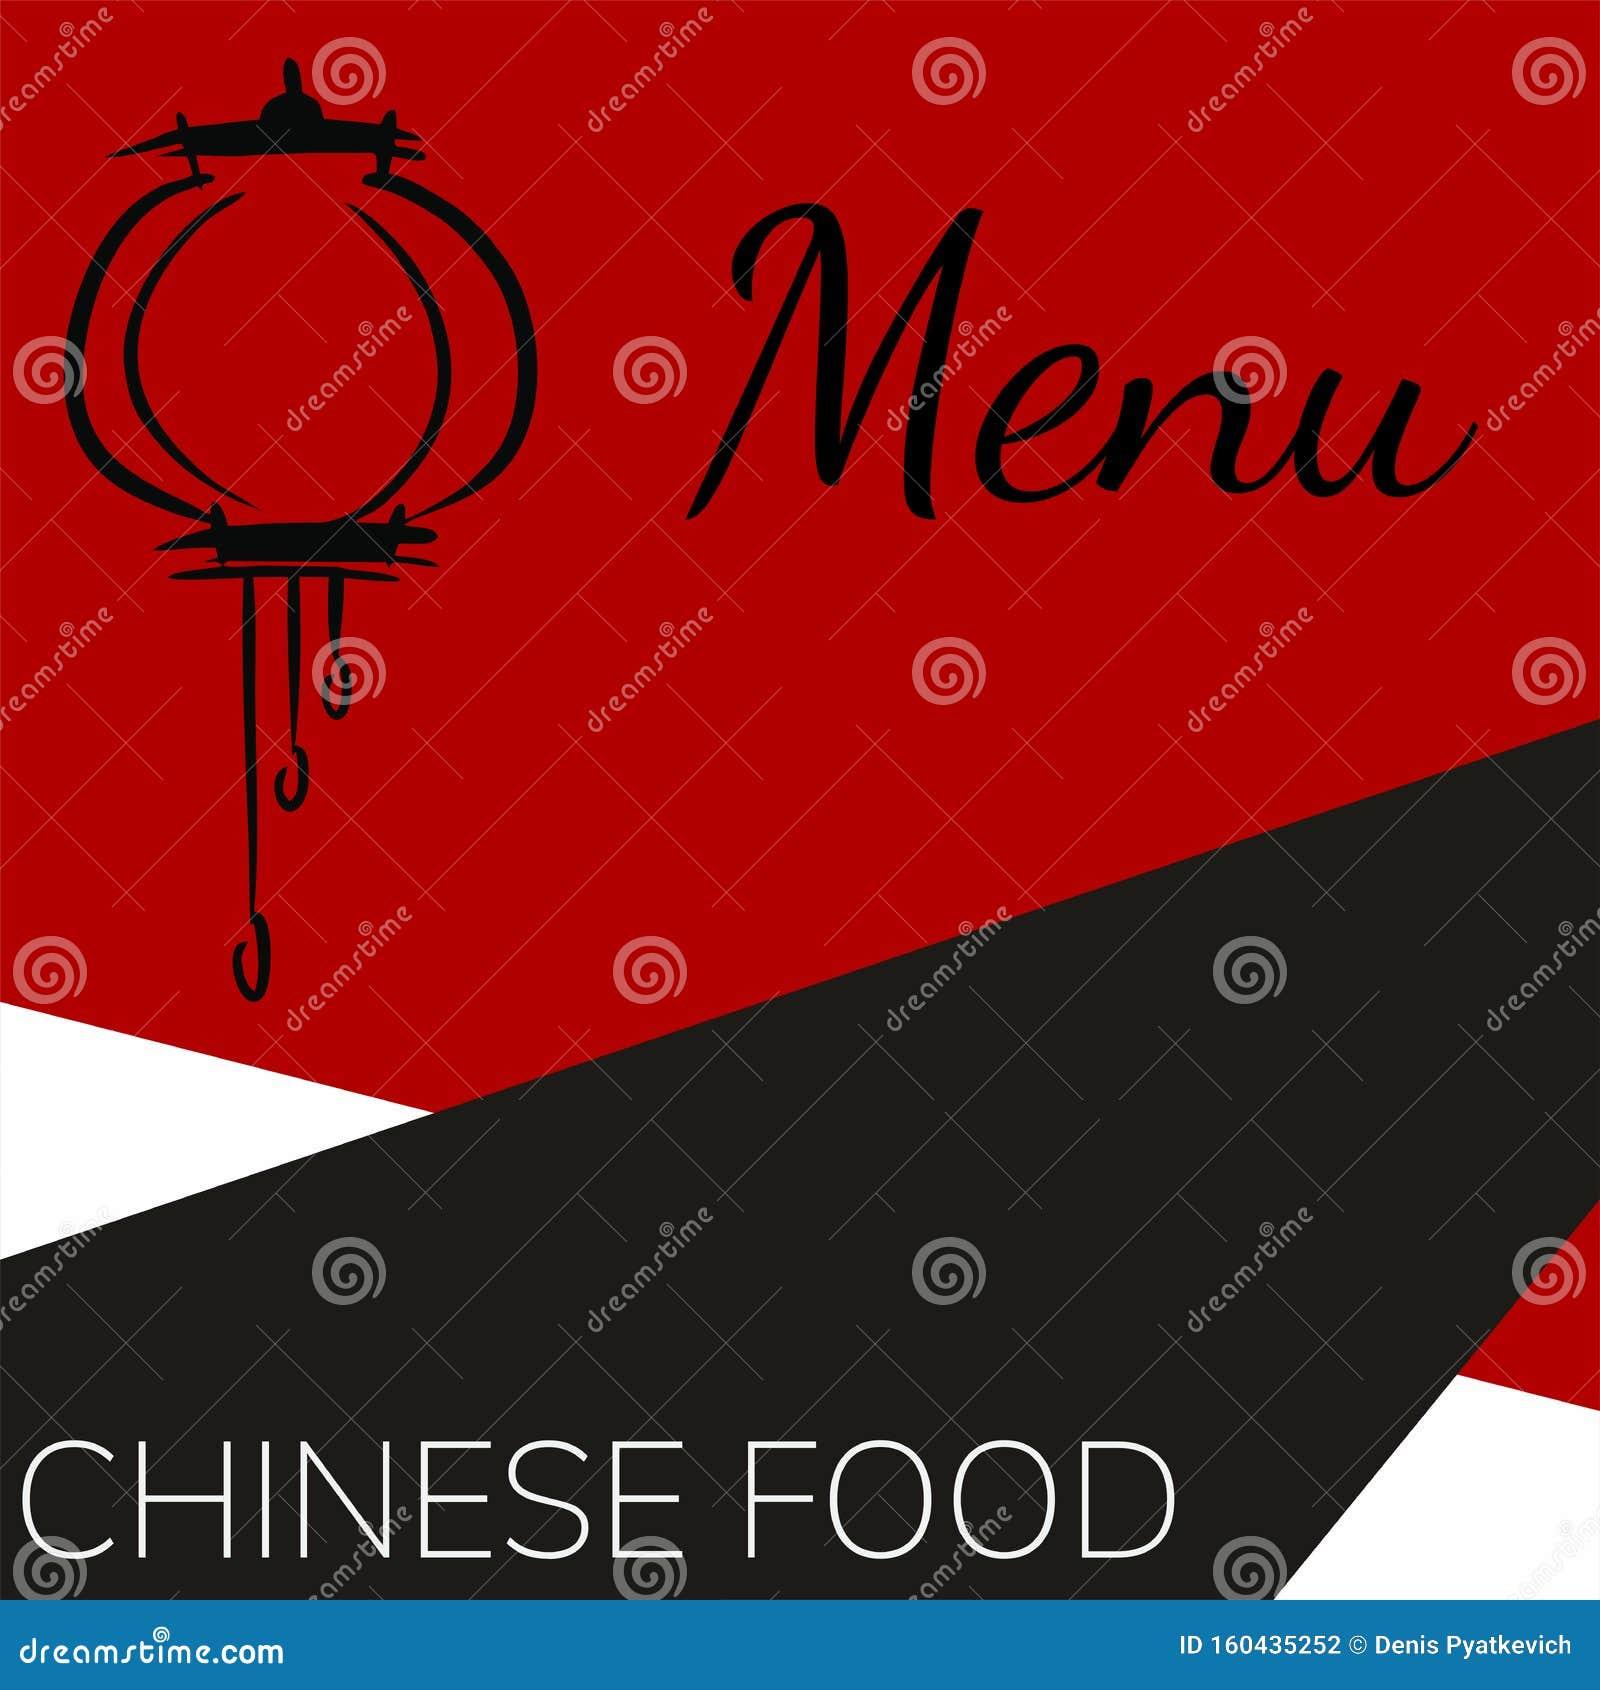 Chinese Restaurant Menu Design Chinese Food Background Stock Vector Illustration Of Decoration Ethnicity 160435252